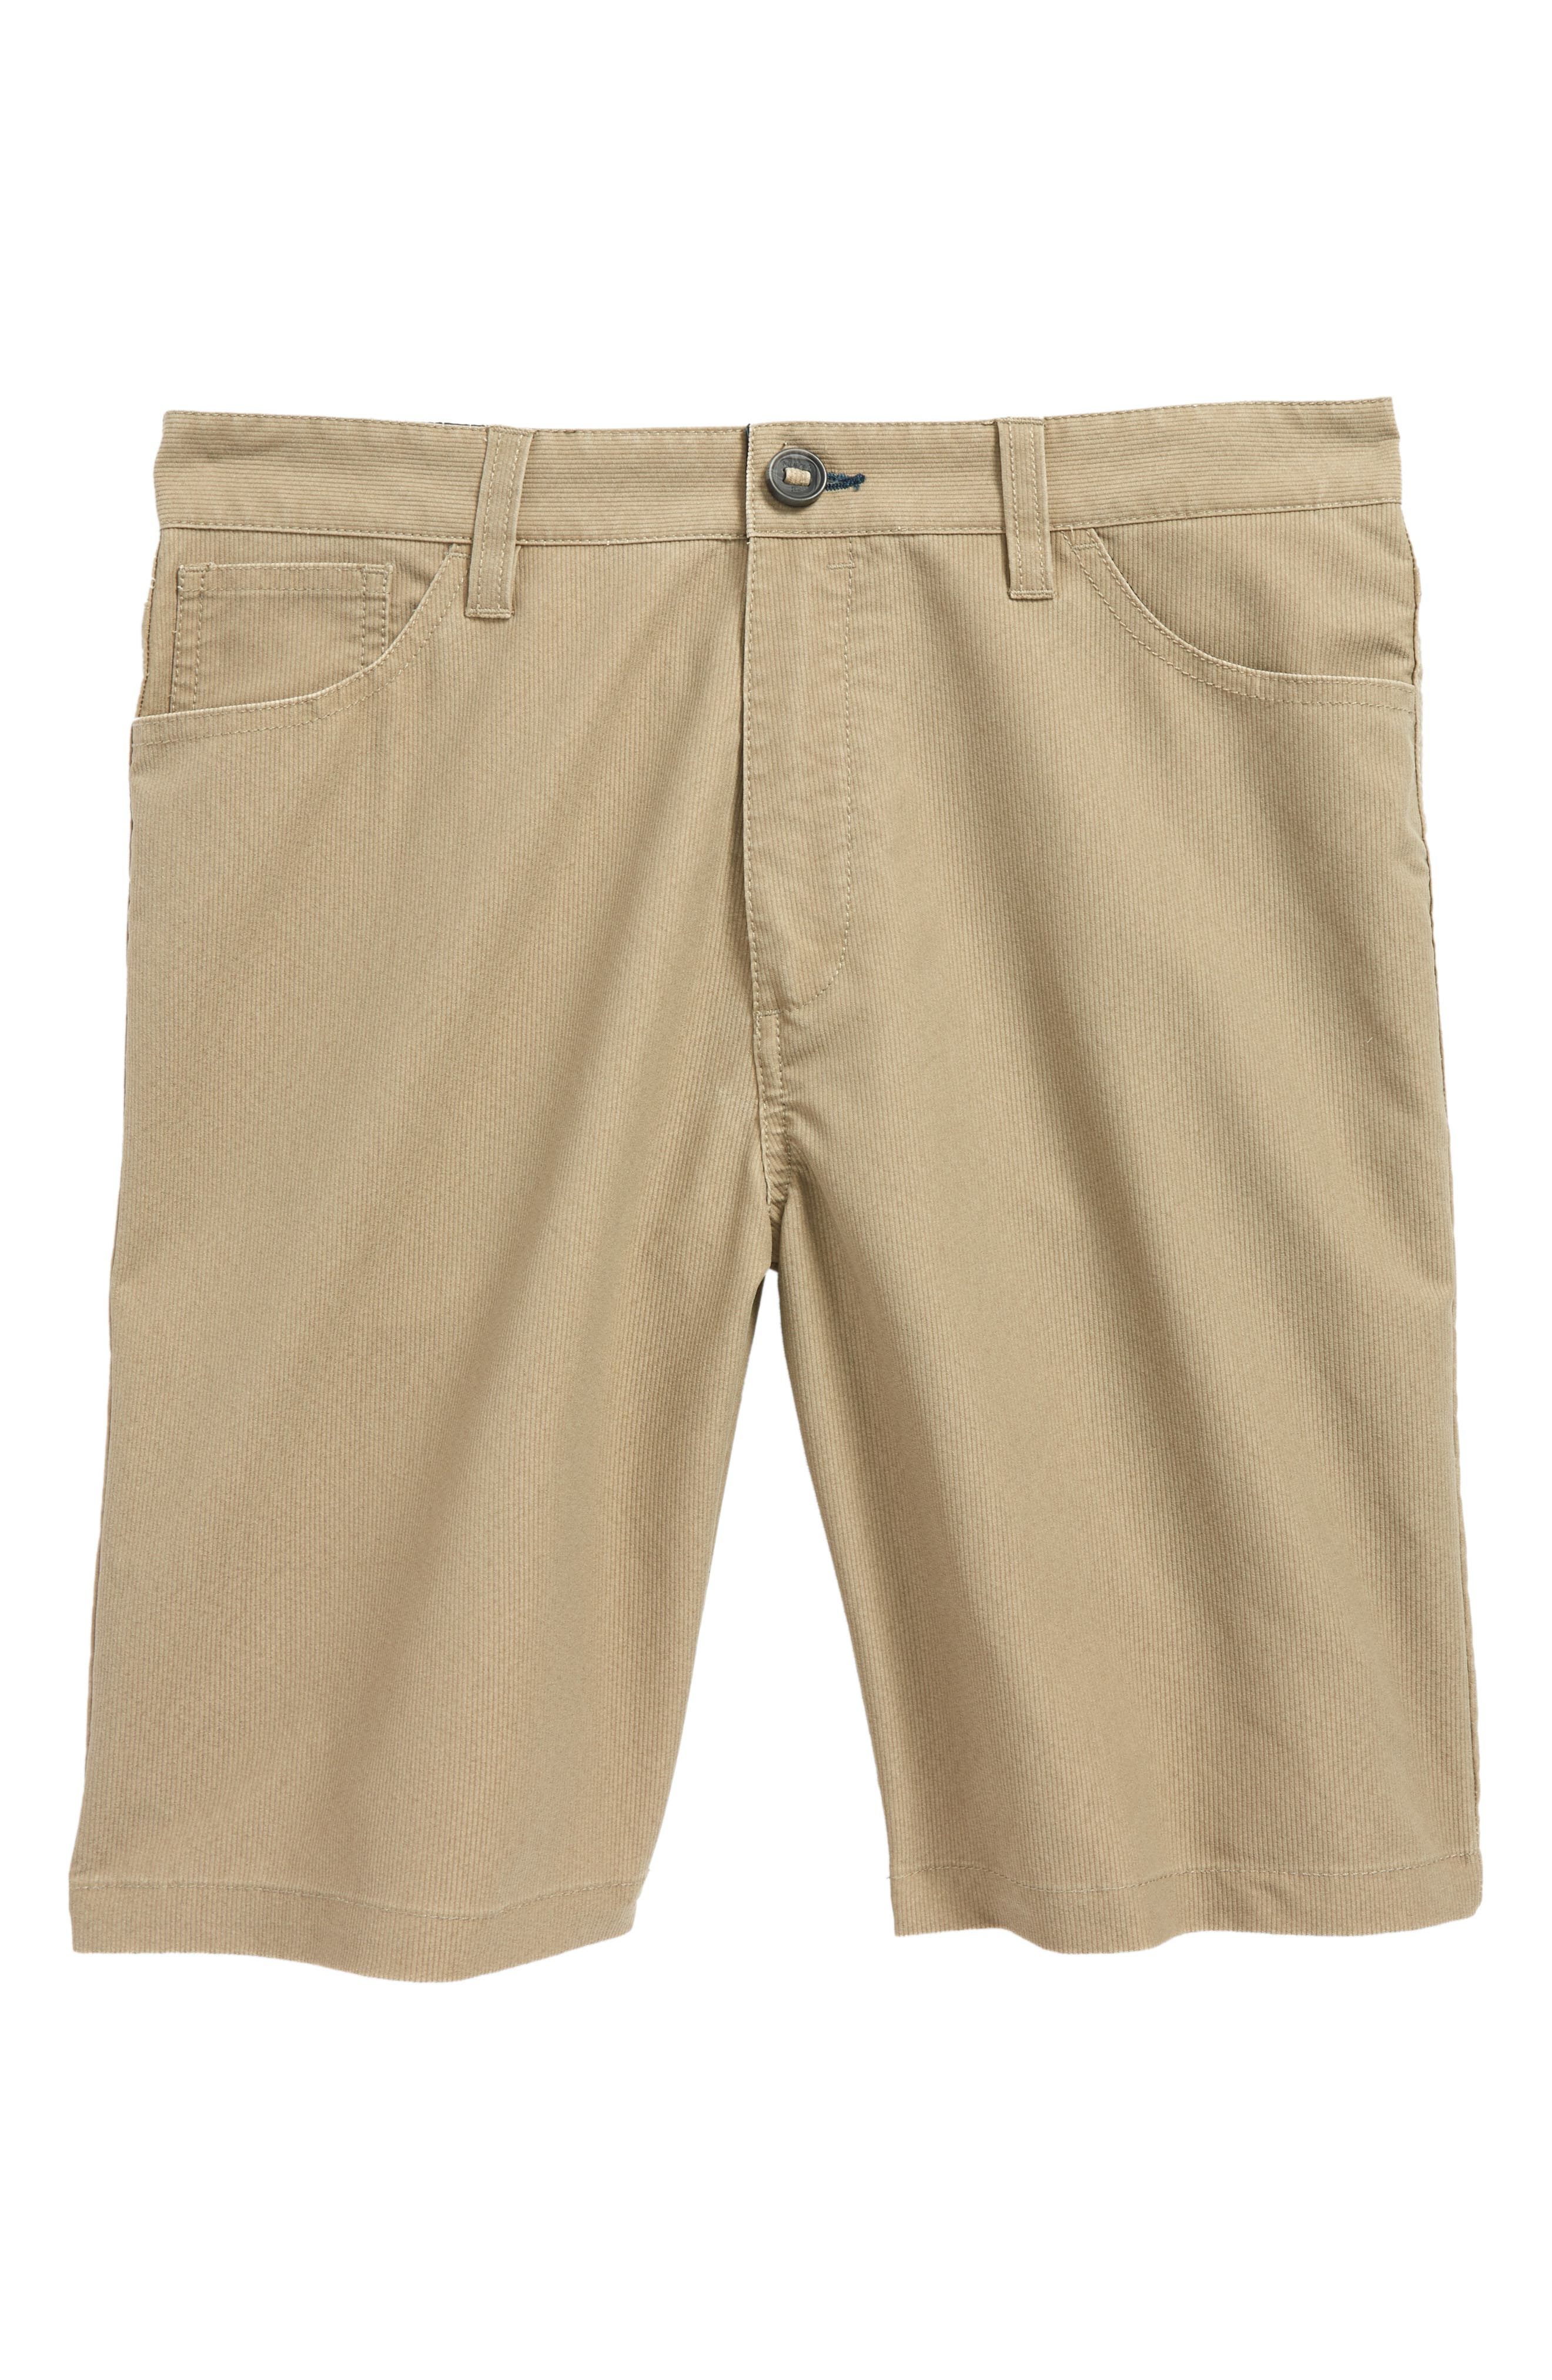 Outsider X Surf Corduroy Hybrid Shorts,                             Main thumbnail 1, color,                             259